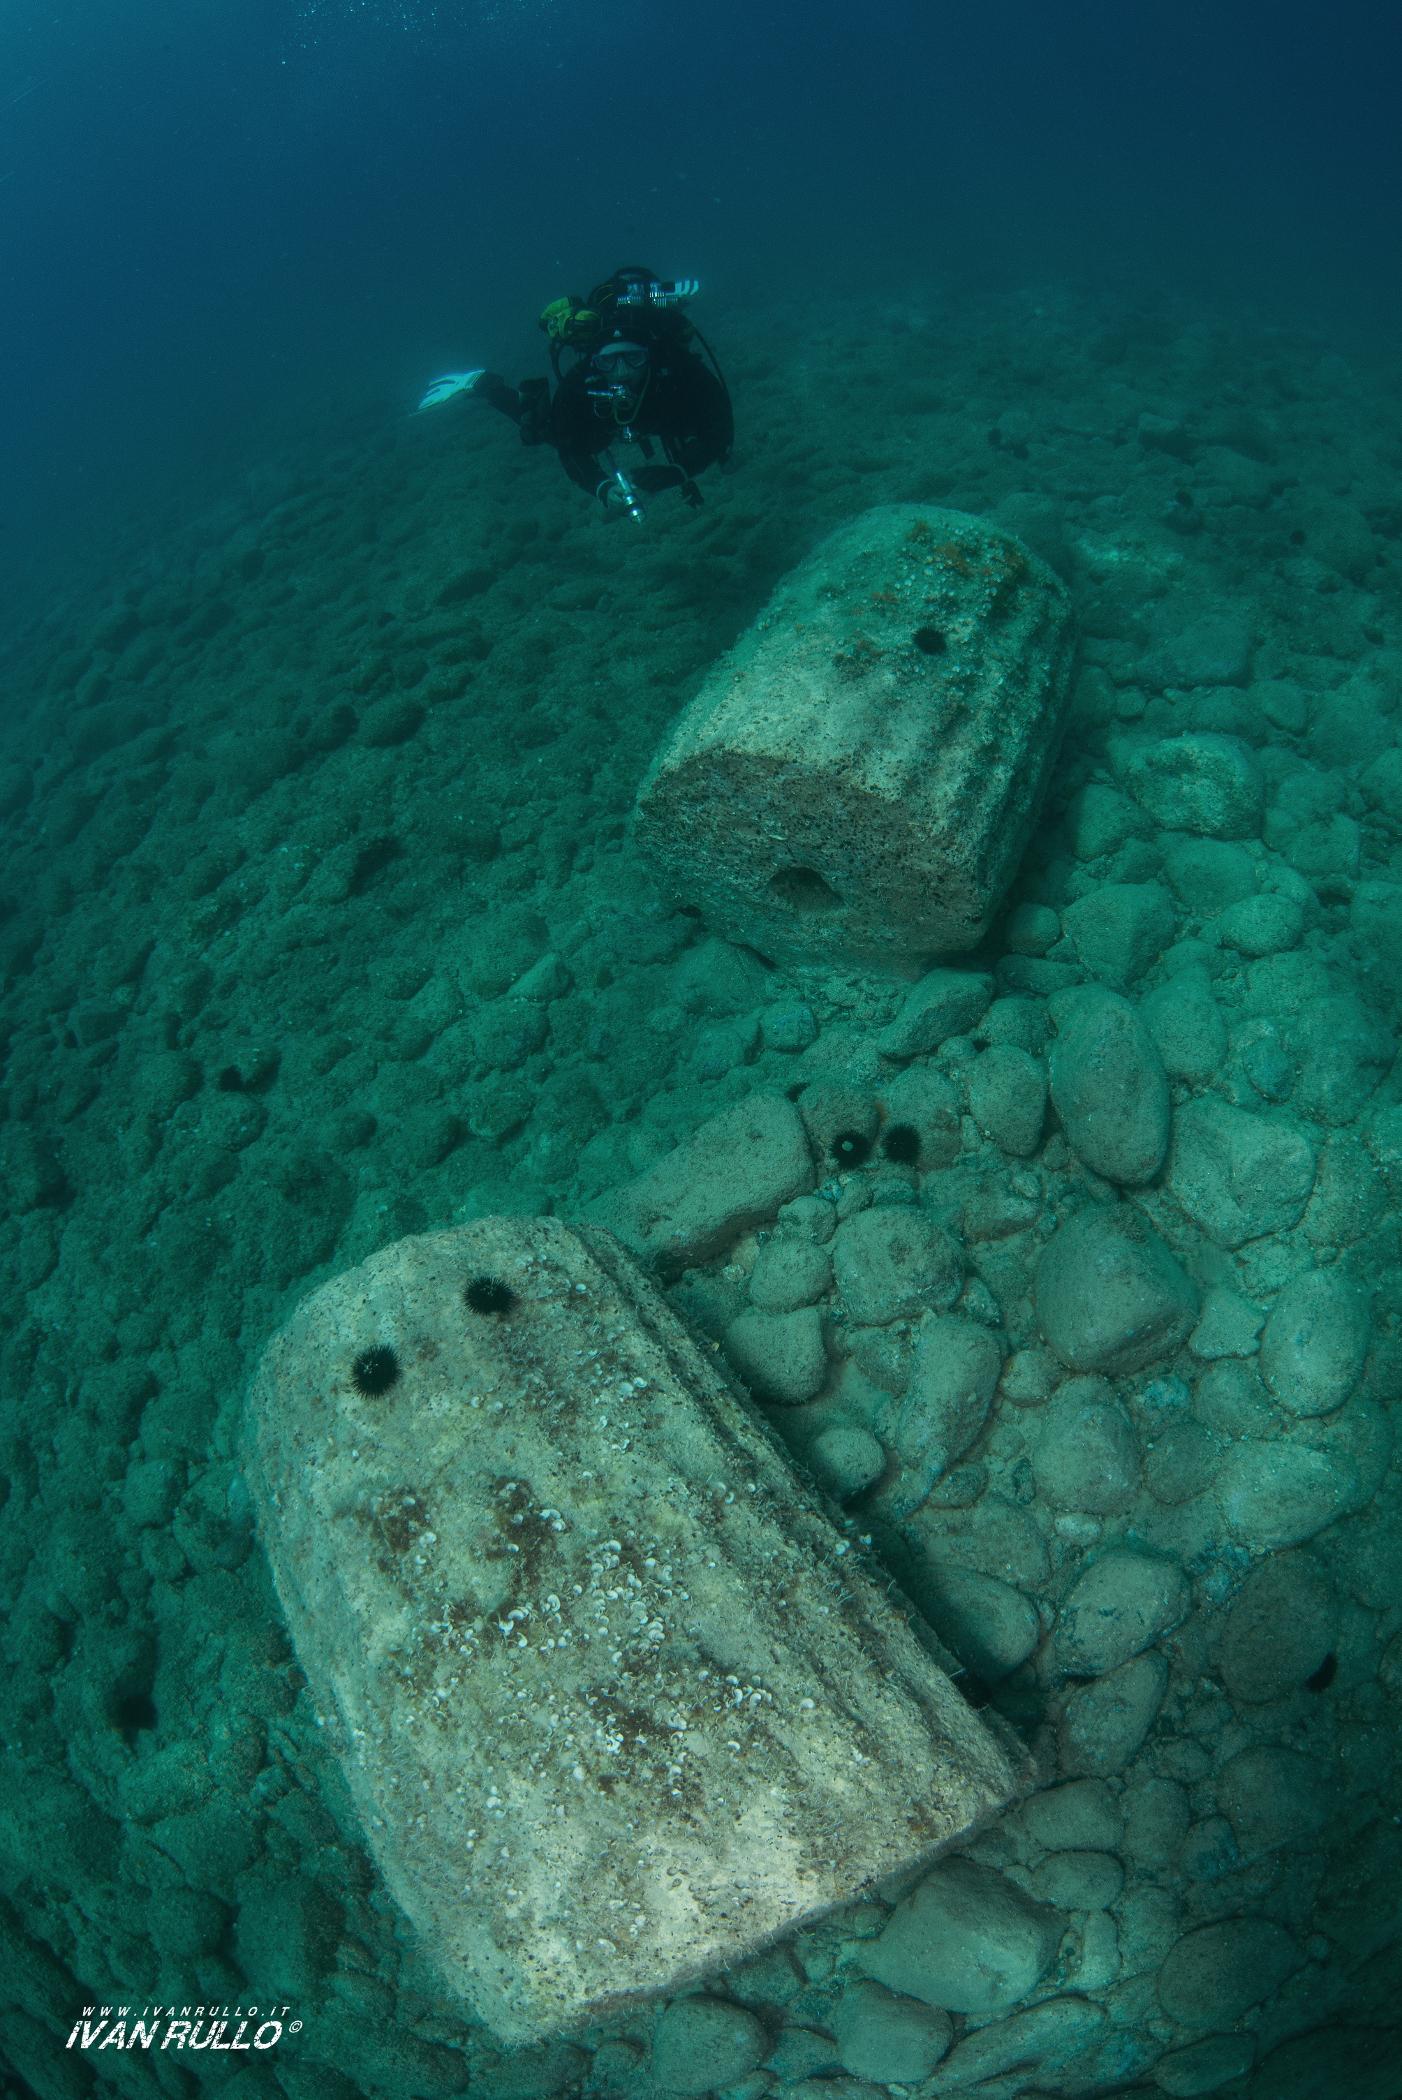 Parco Archeologico subacqueo dell'antica Kaulon a Monasterace Marina Reggio Calabria